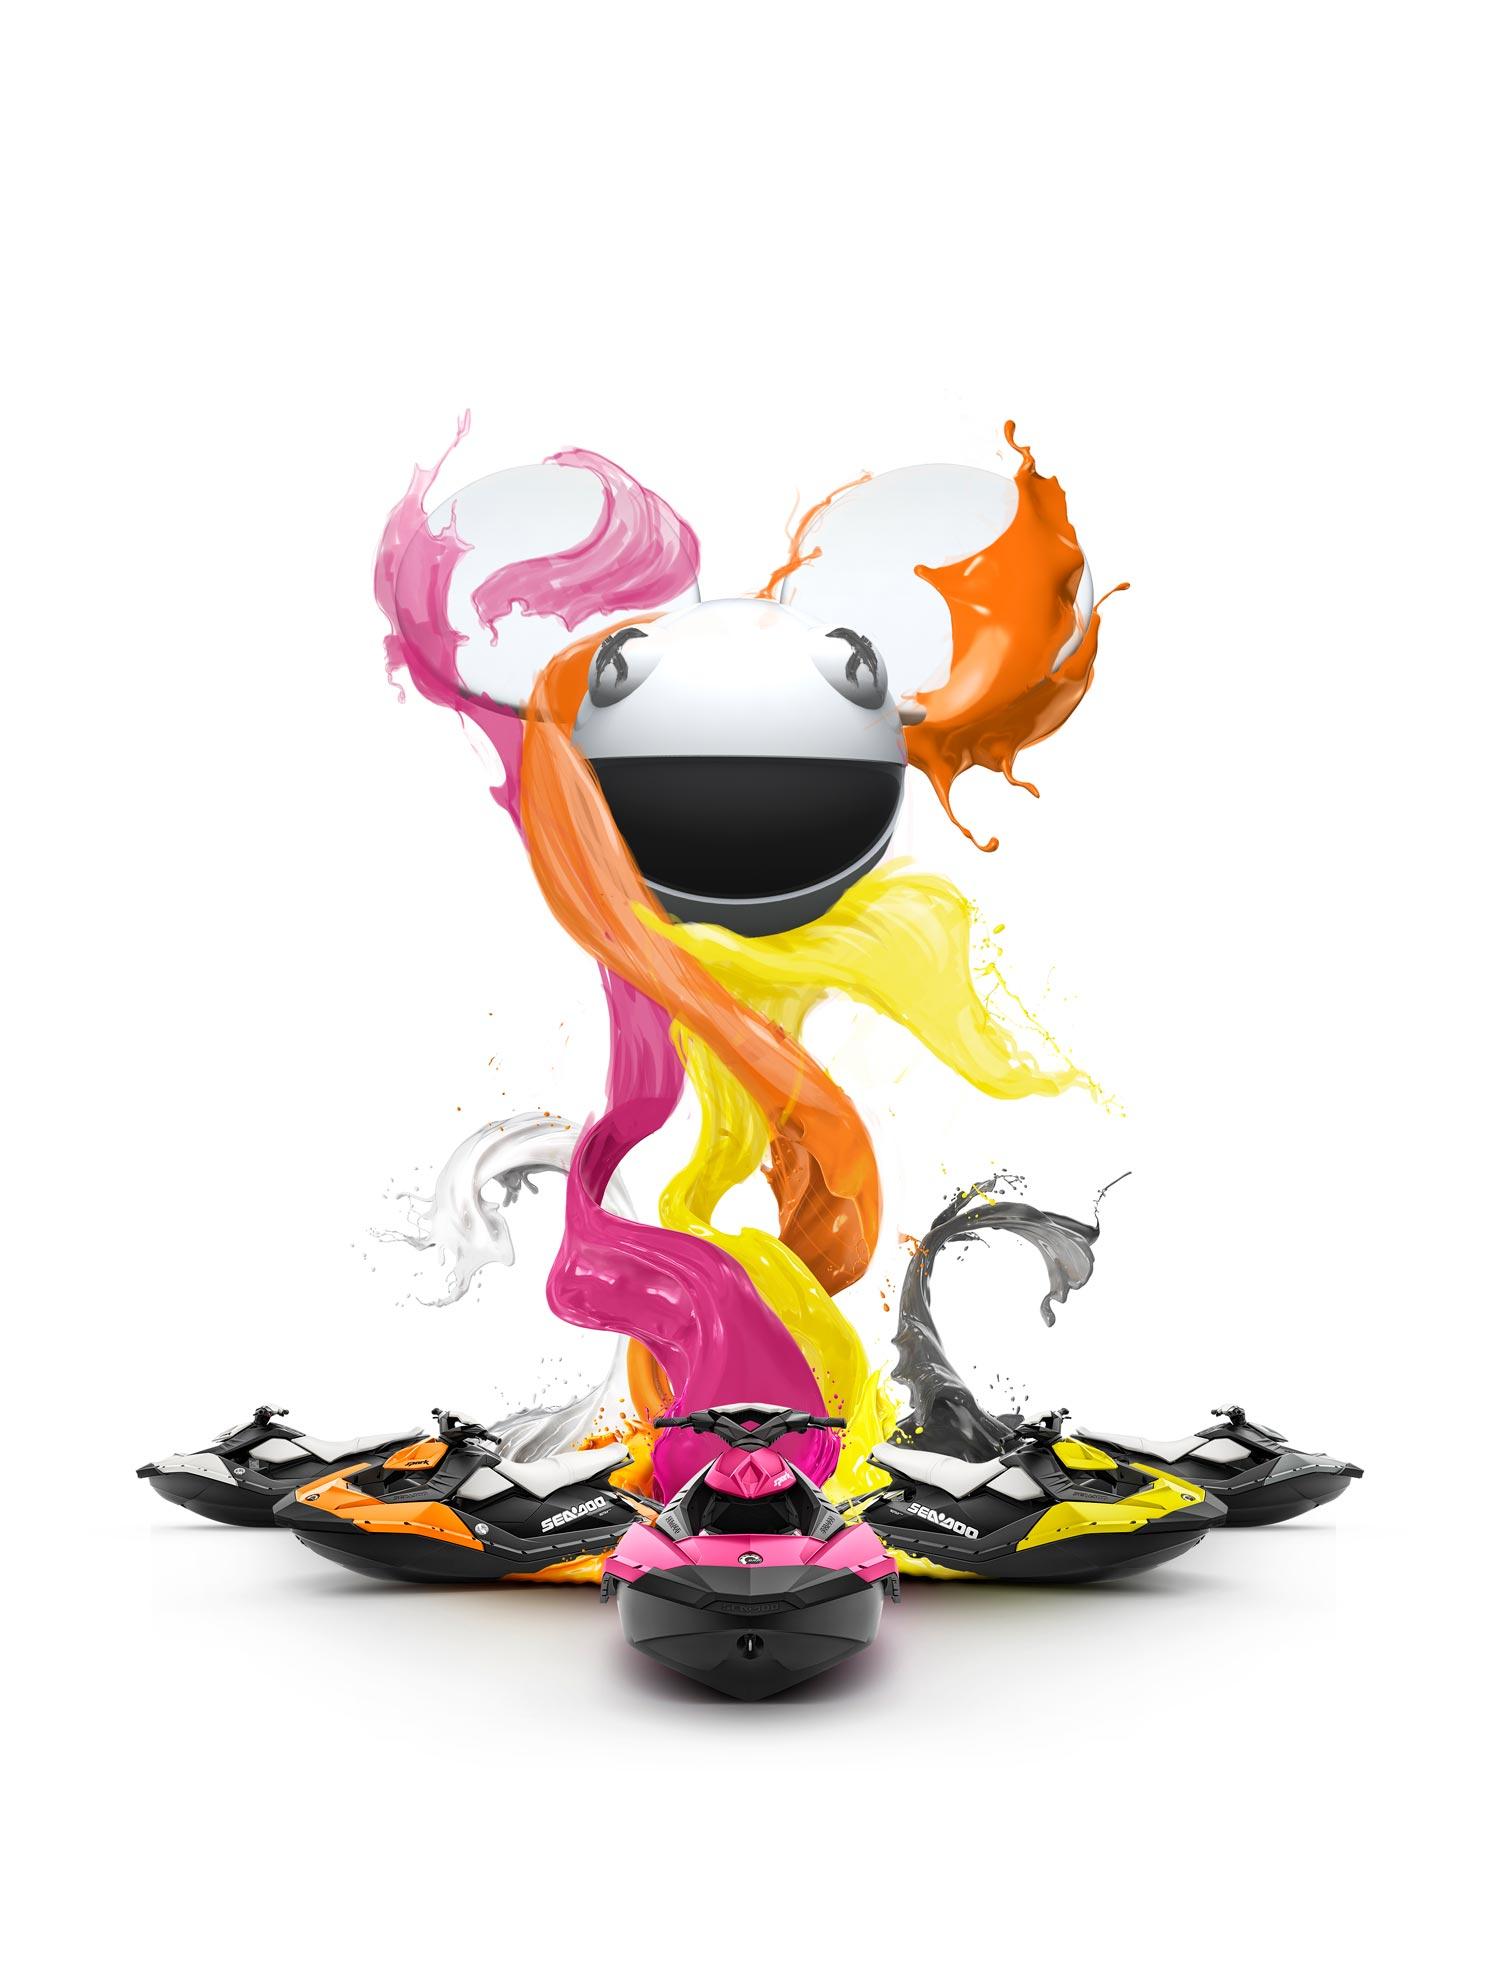 Sea-Doo Spark Paint Design Deadmau5